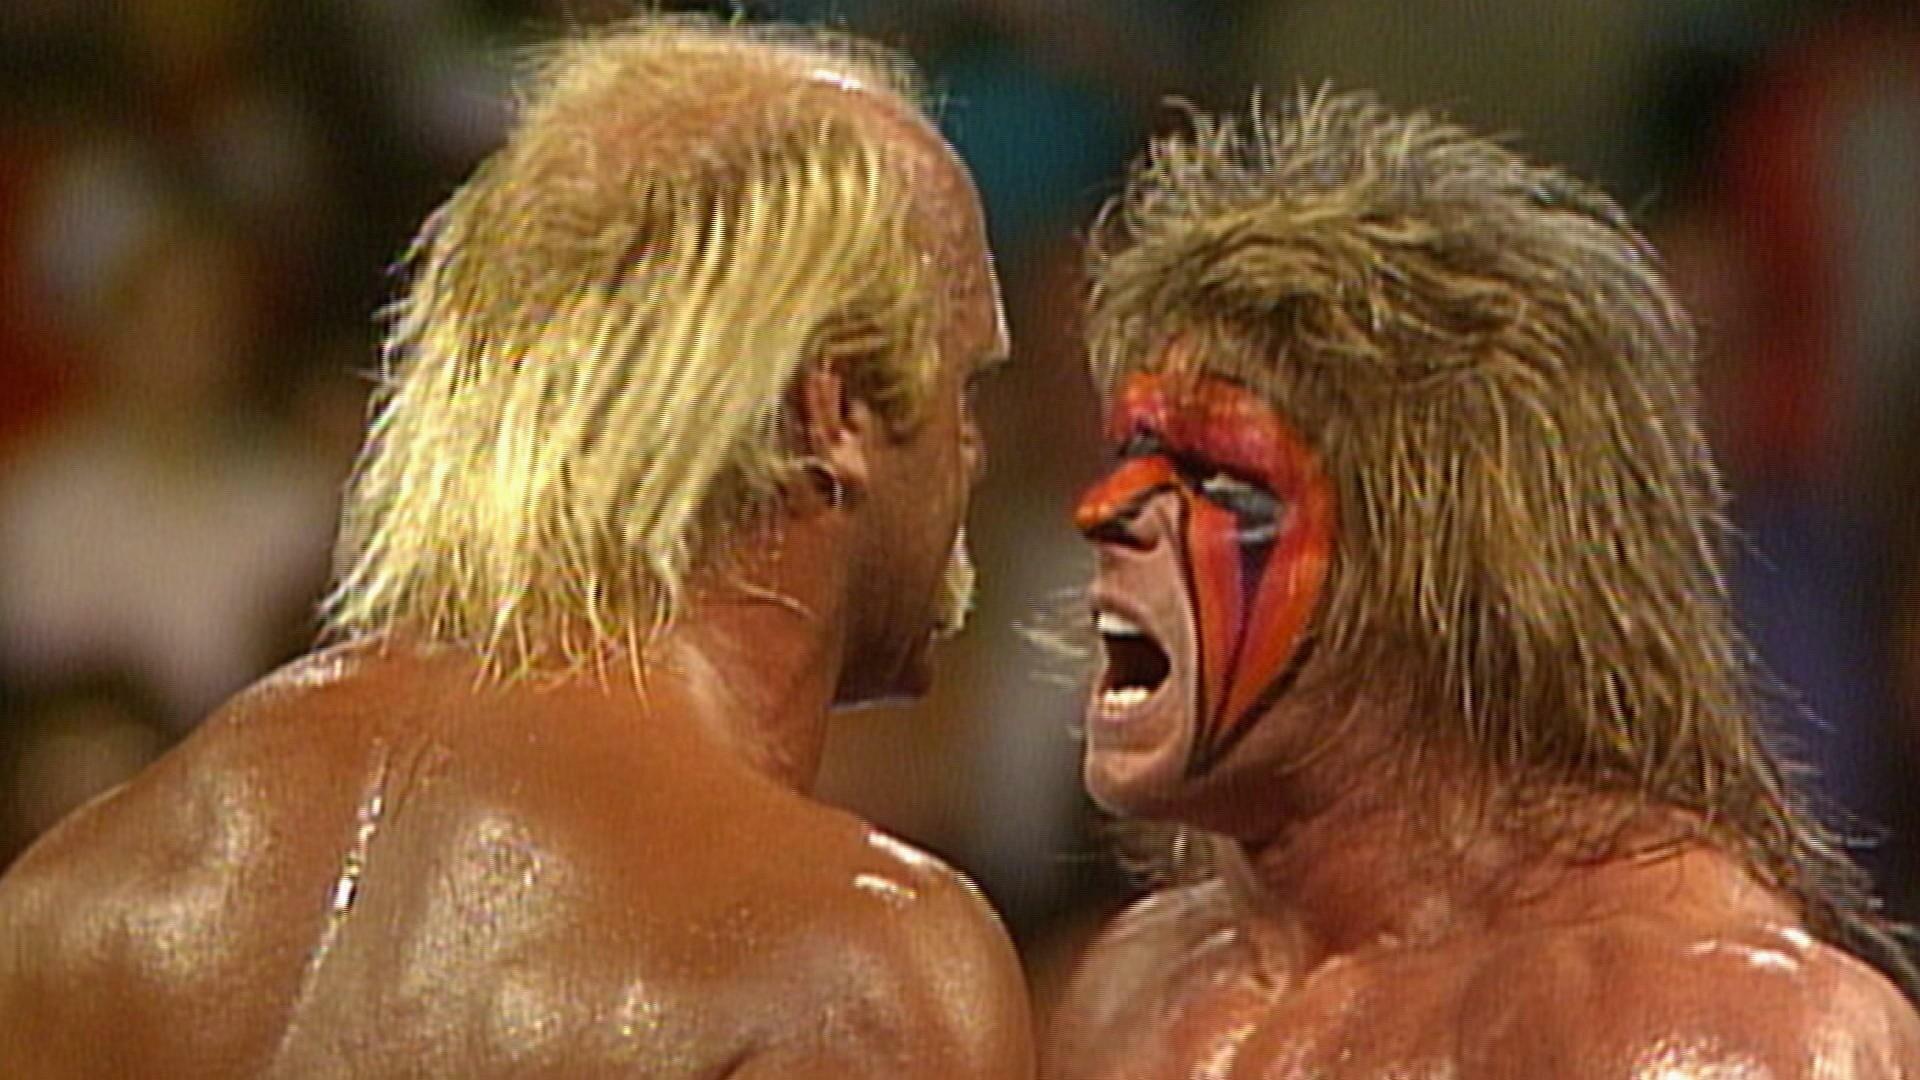 Warrior vs. Hogan